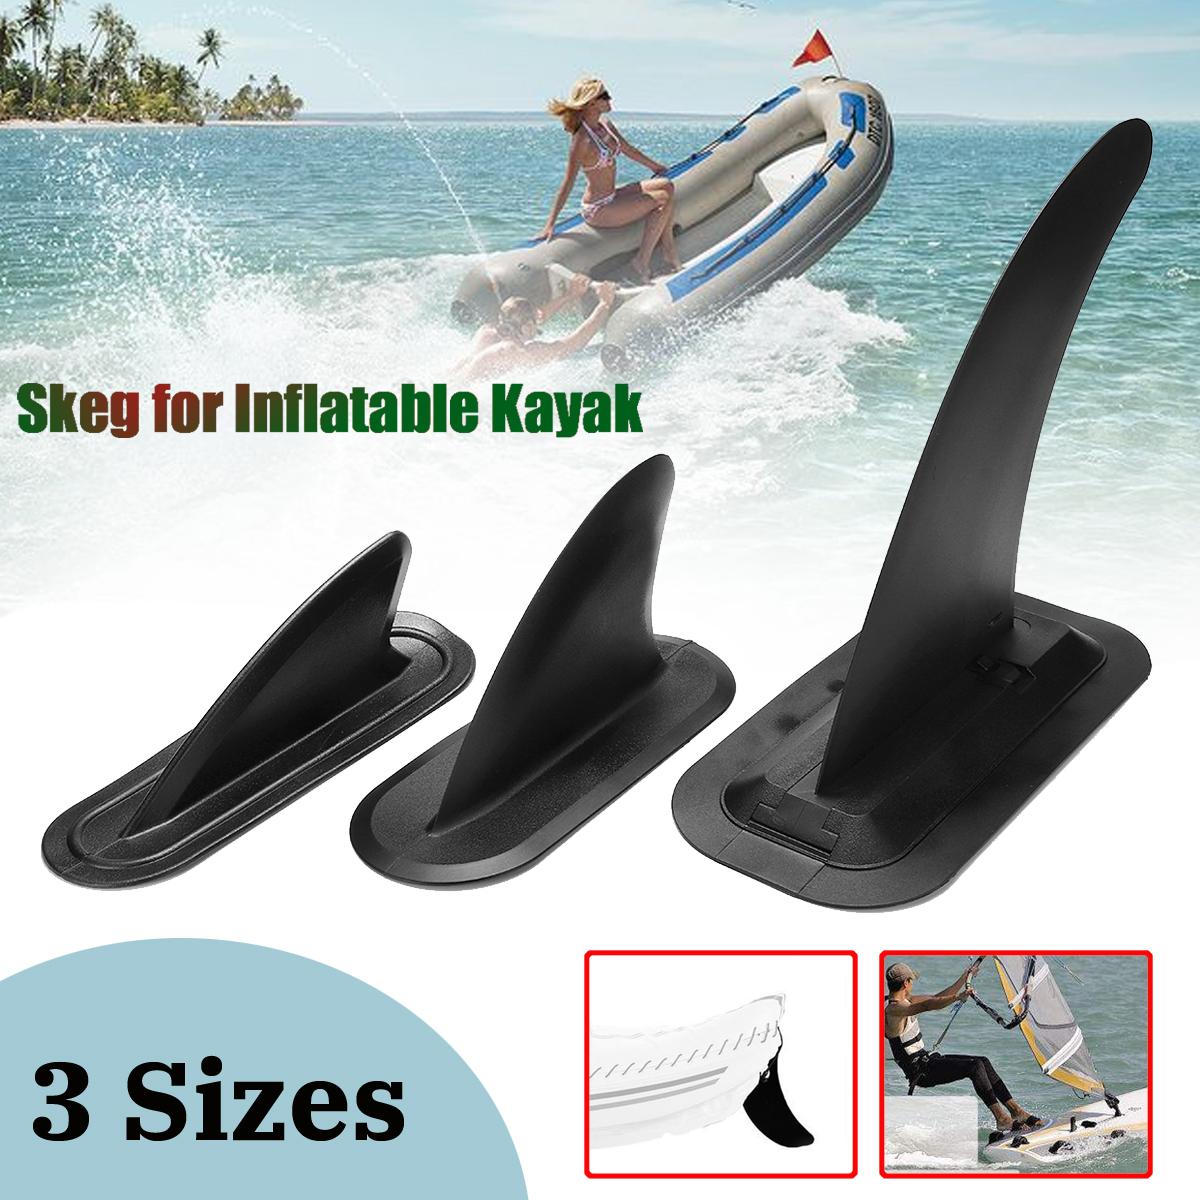 Universal Kayak Skeg Inflatable Fishing Boat Mounting Points Watershed Board